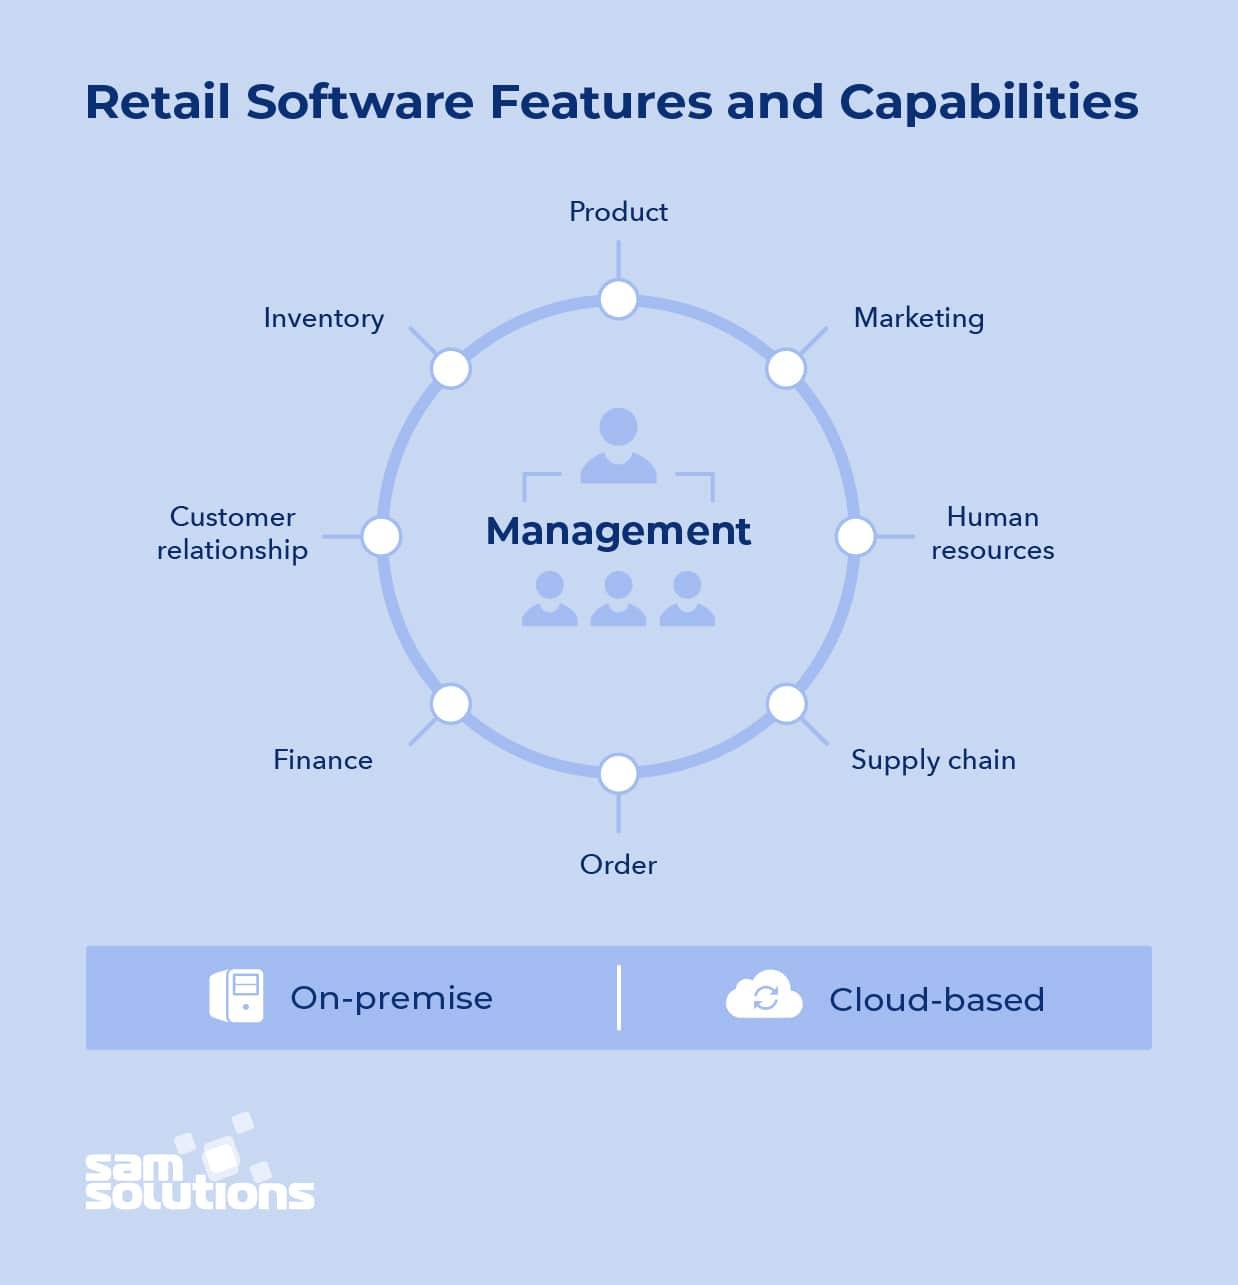 Retail-software-capabilities